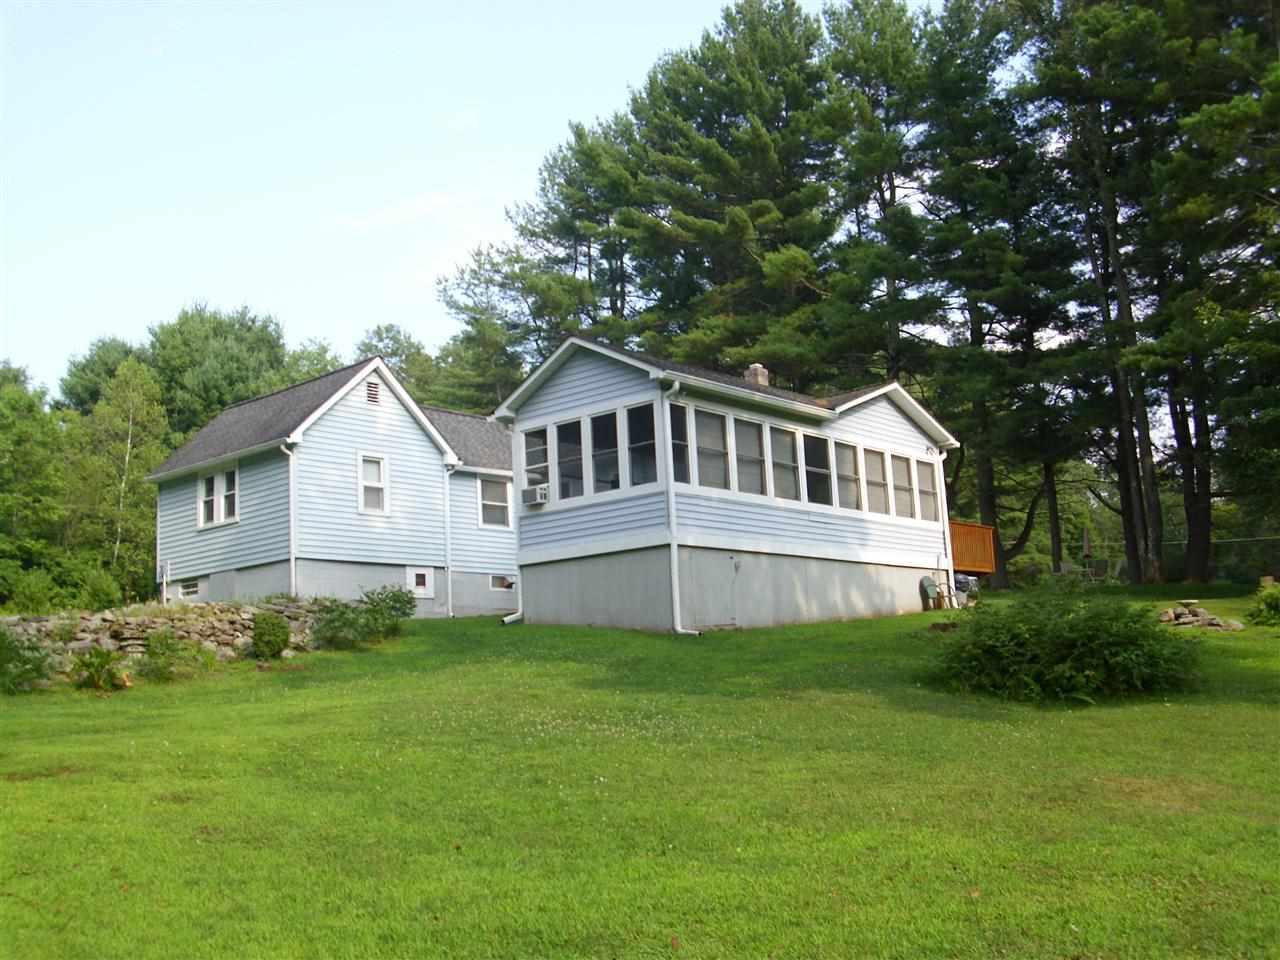 Real Estate for Sale, ListingId: 31769618, Cochecton,NY12726